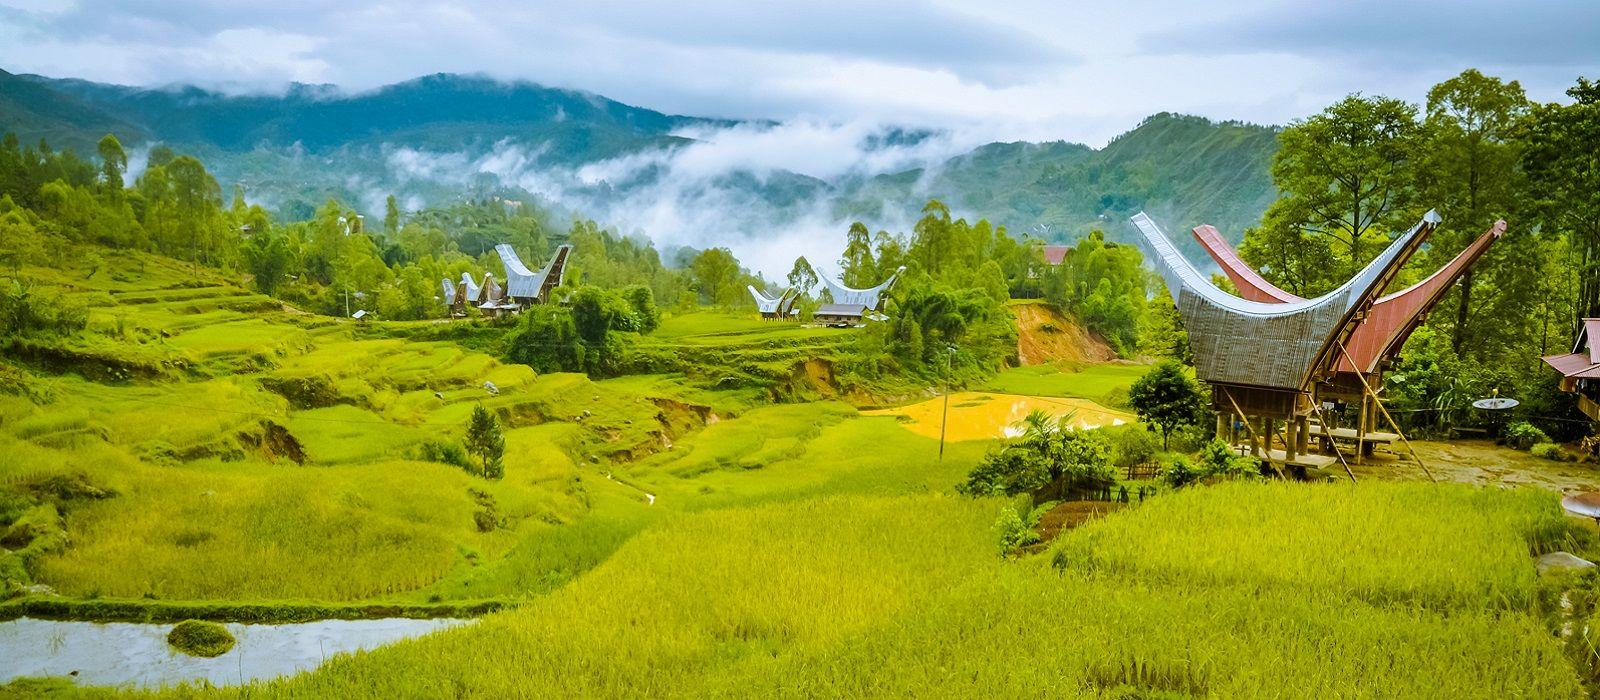 Reiseziel Toraja Indonesien